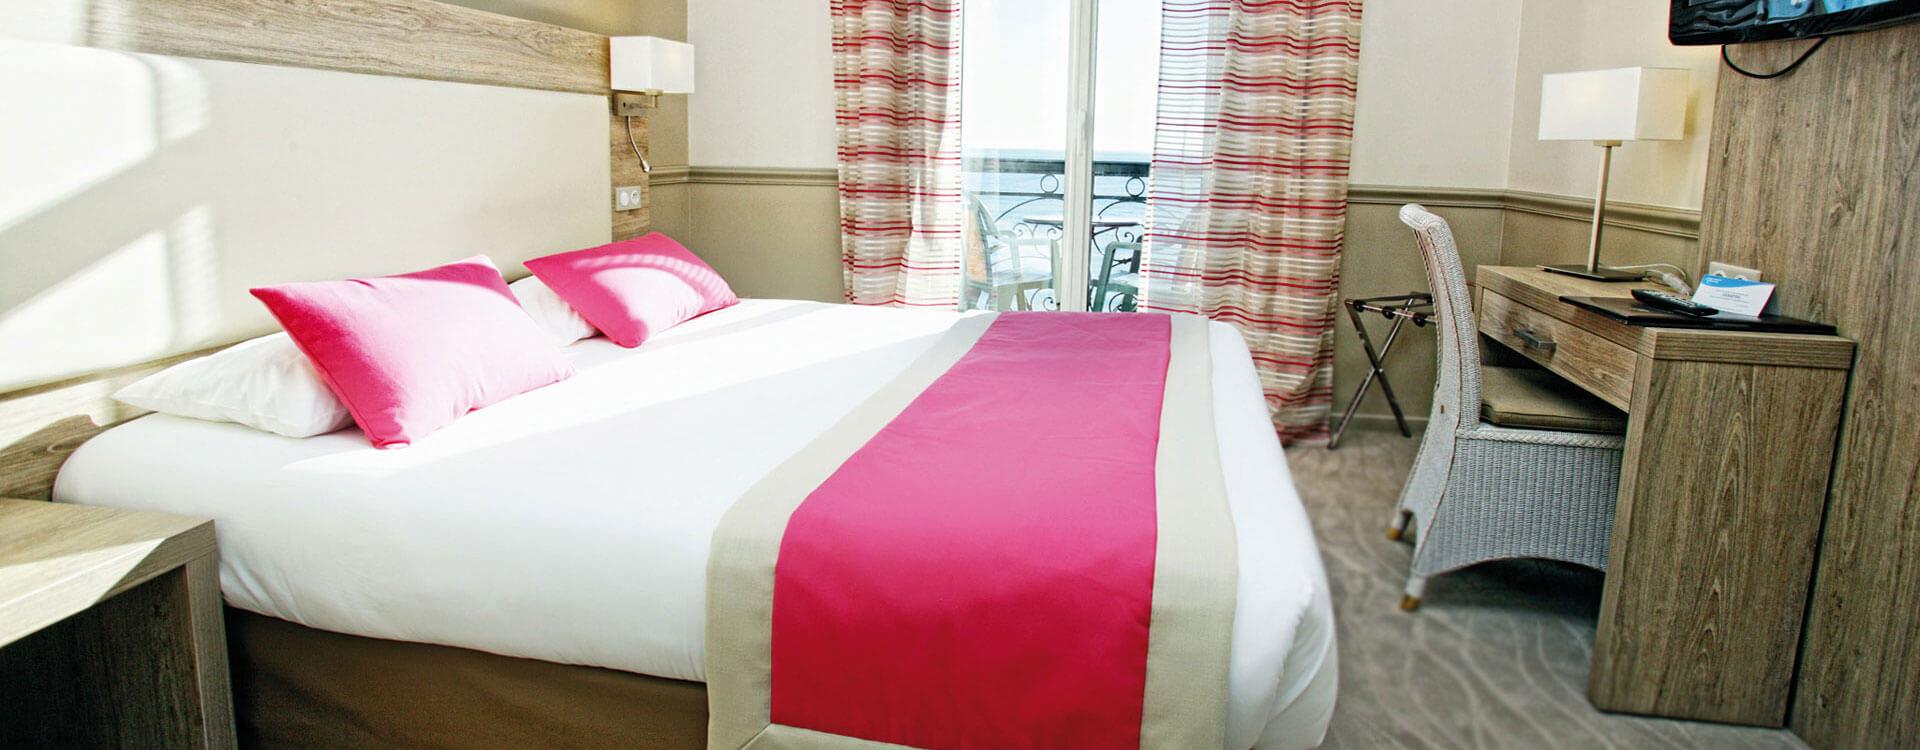 Chambre standard vue mer - Hôtel*** Royal Westminster à Menton